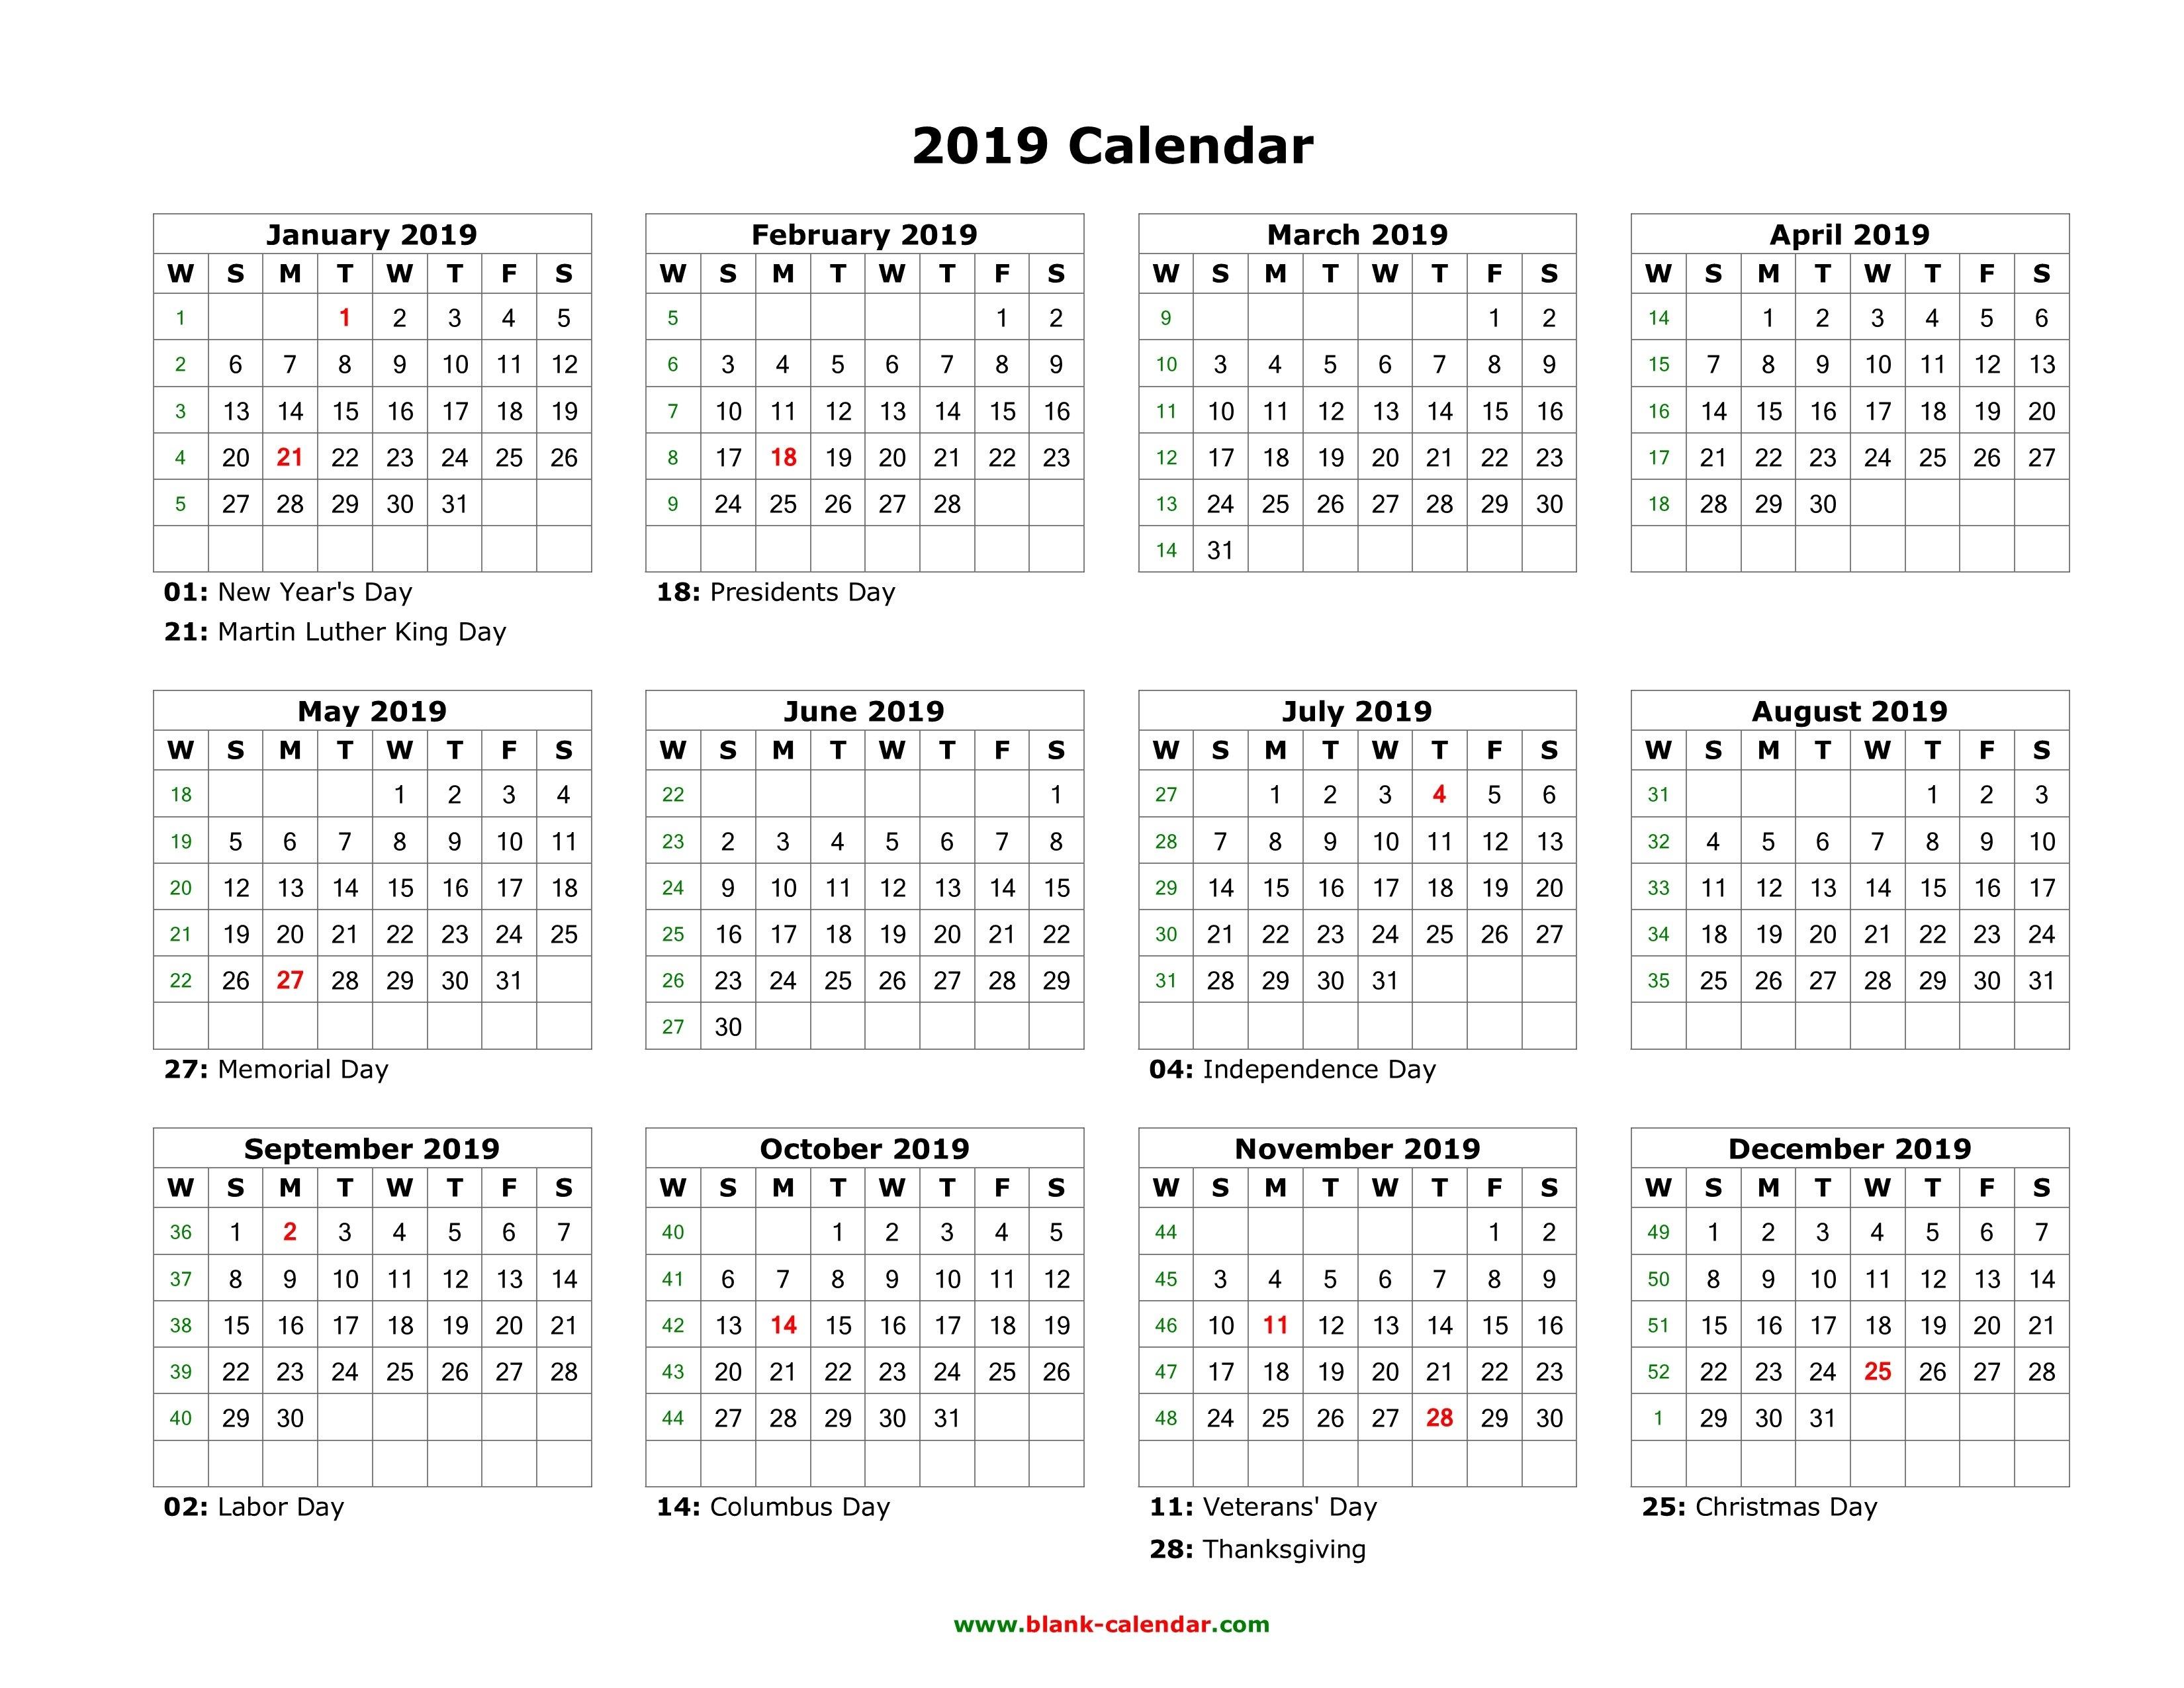 Blank Calendar 2019 | Free Download Calendar Templates E Calendar 2019 Download